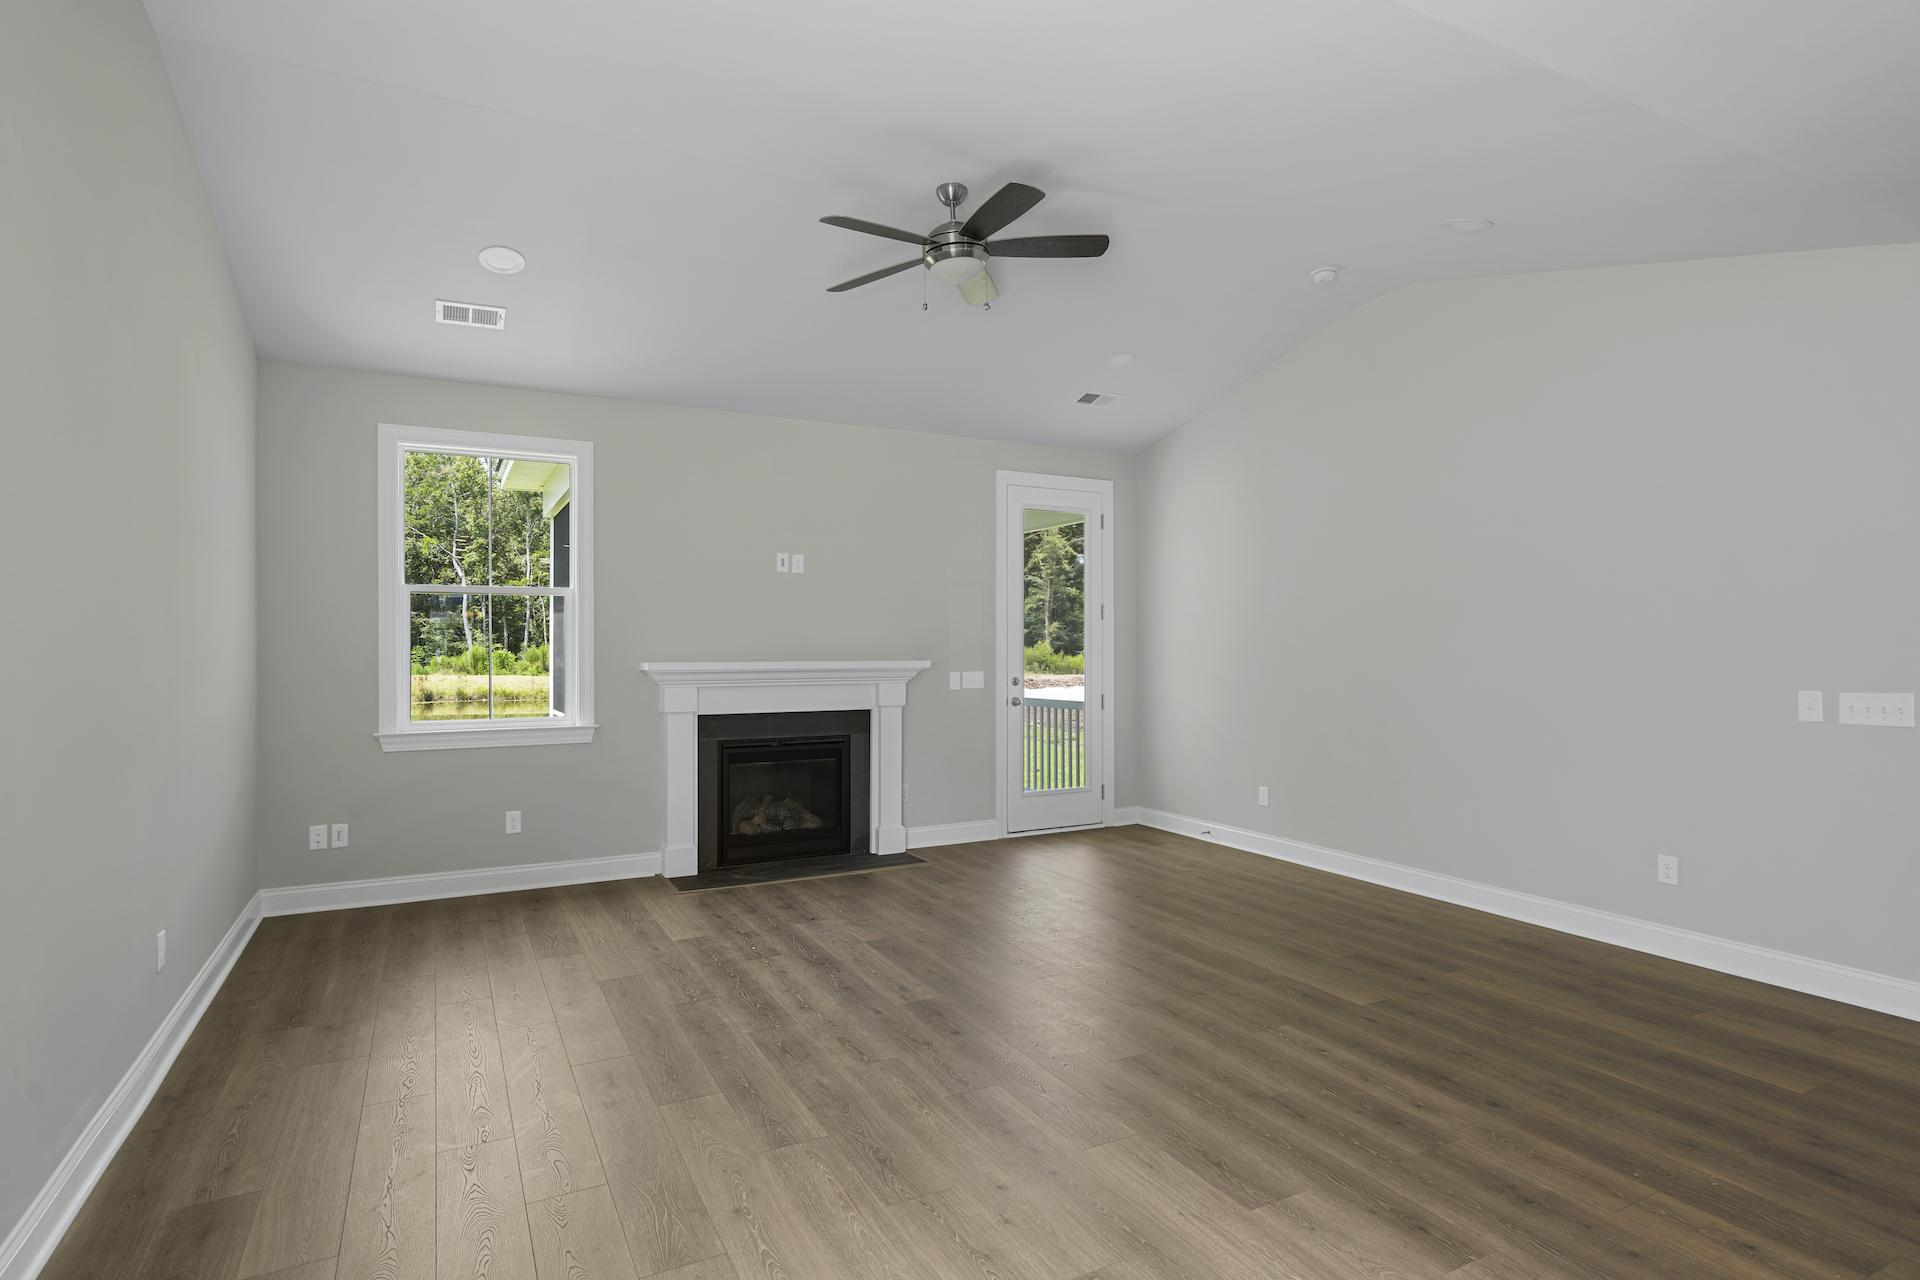 Drayton Oaks Homes For Sale - 105 Plowden Mill, Summerville, SC - 20